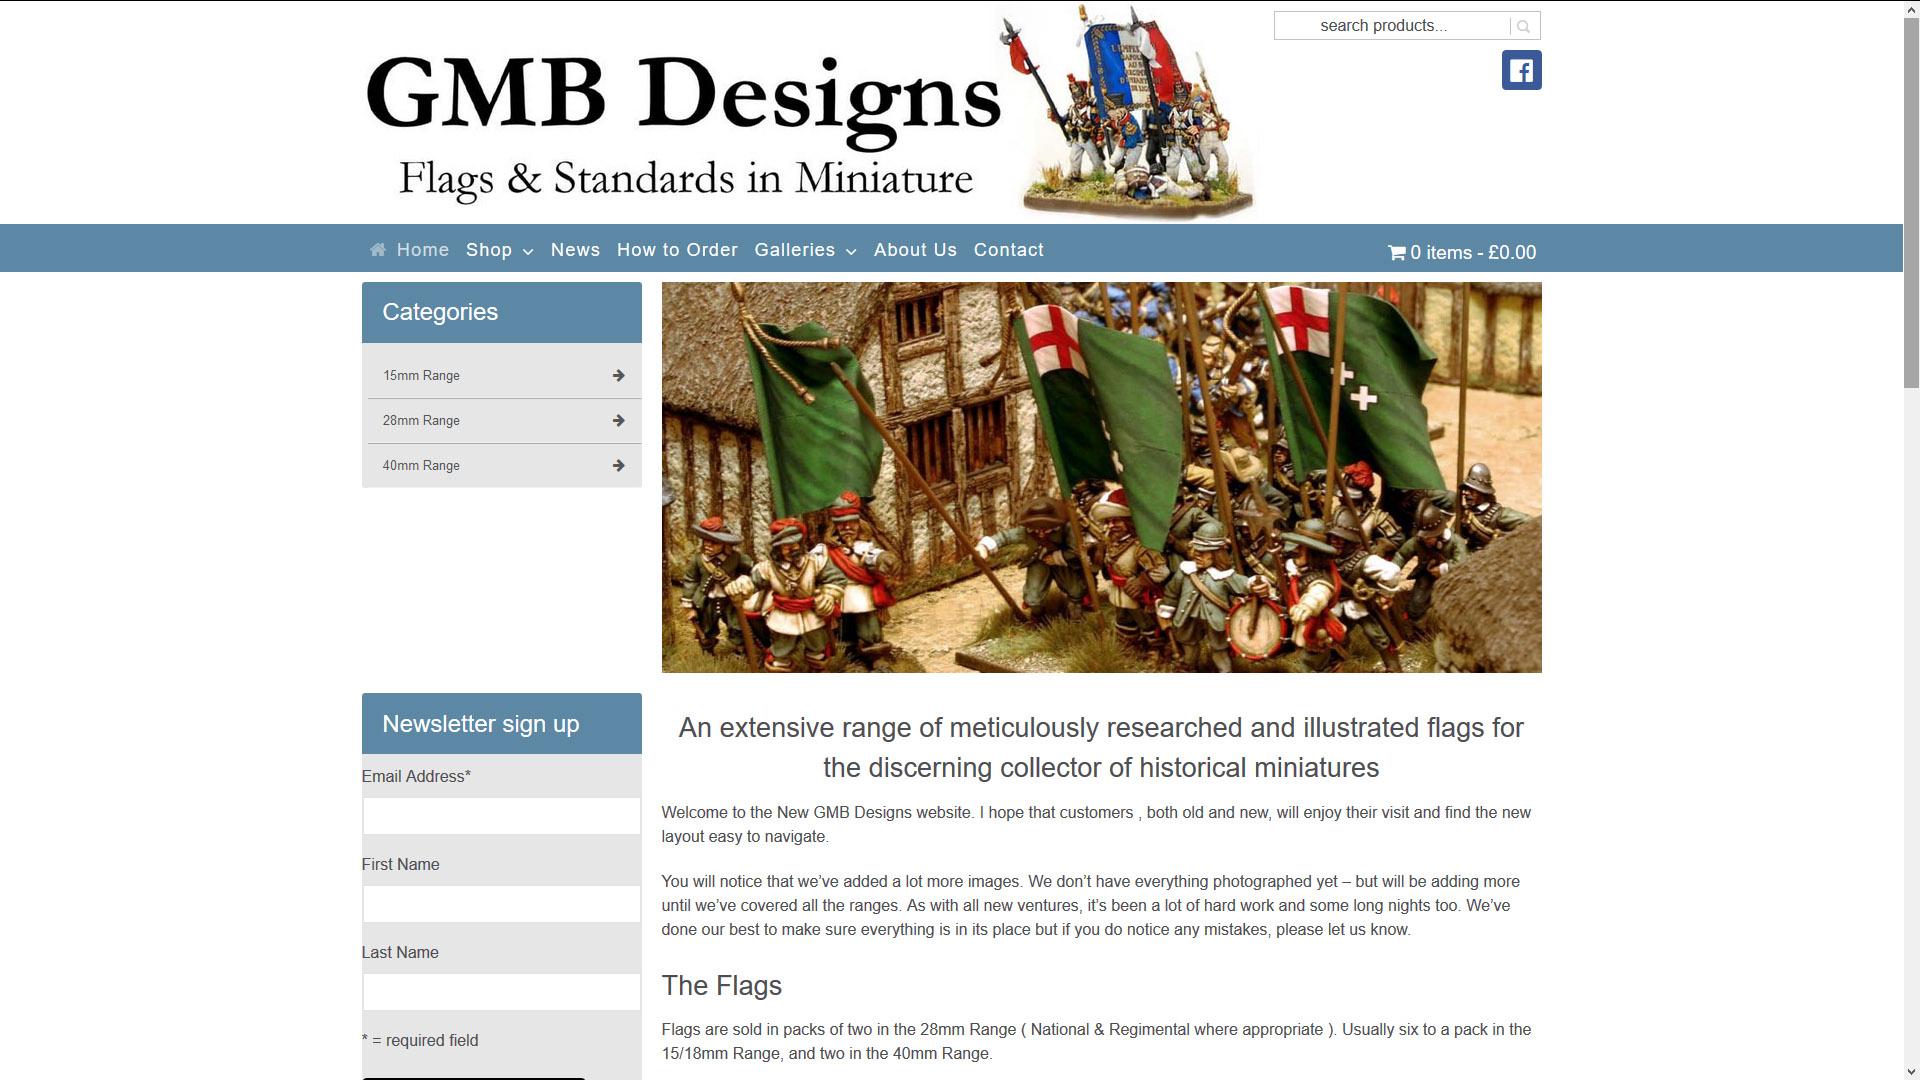 GMB Designs